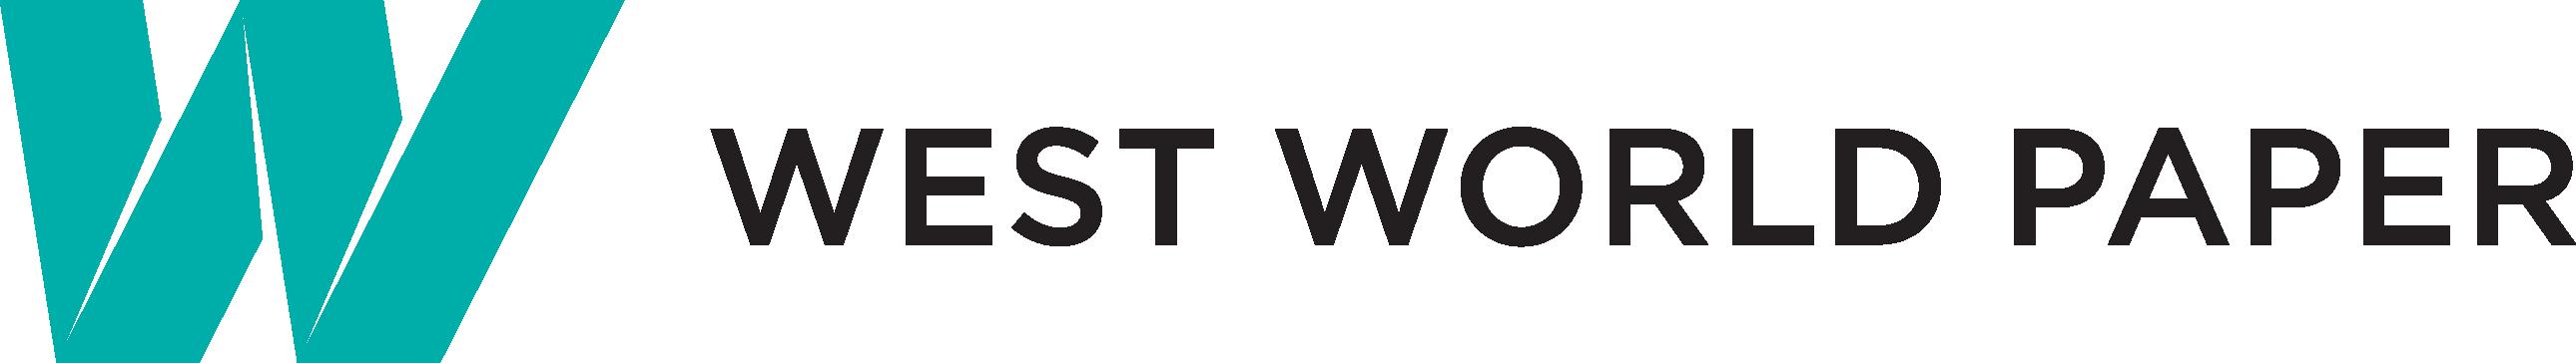 West World Paper